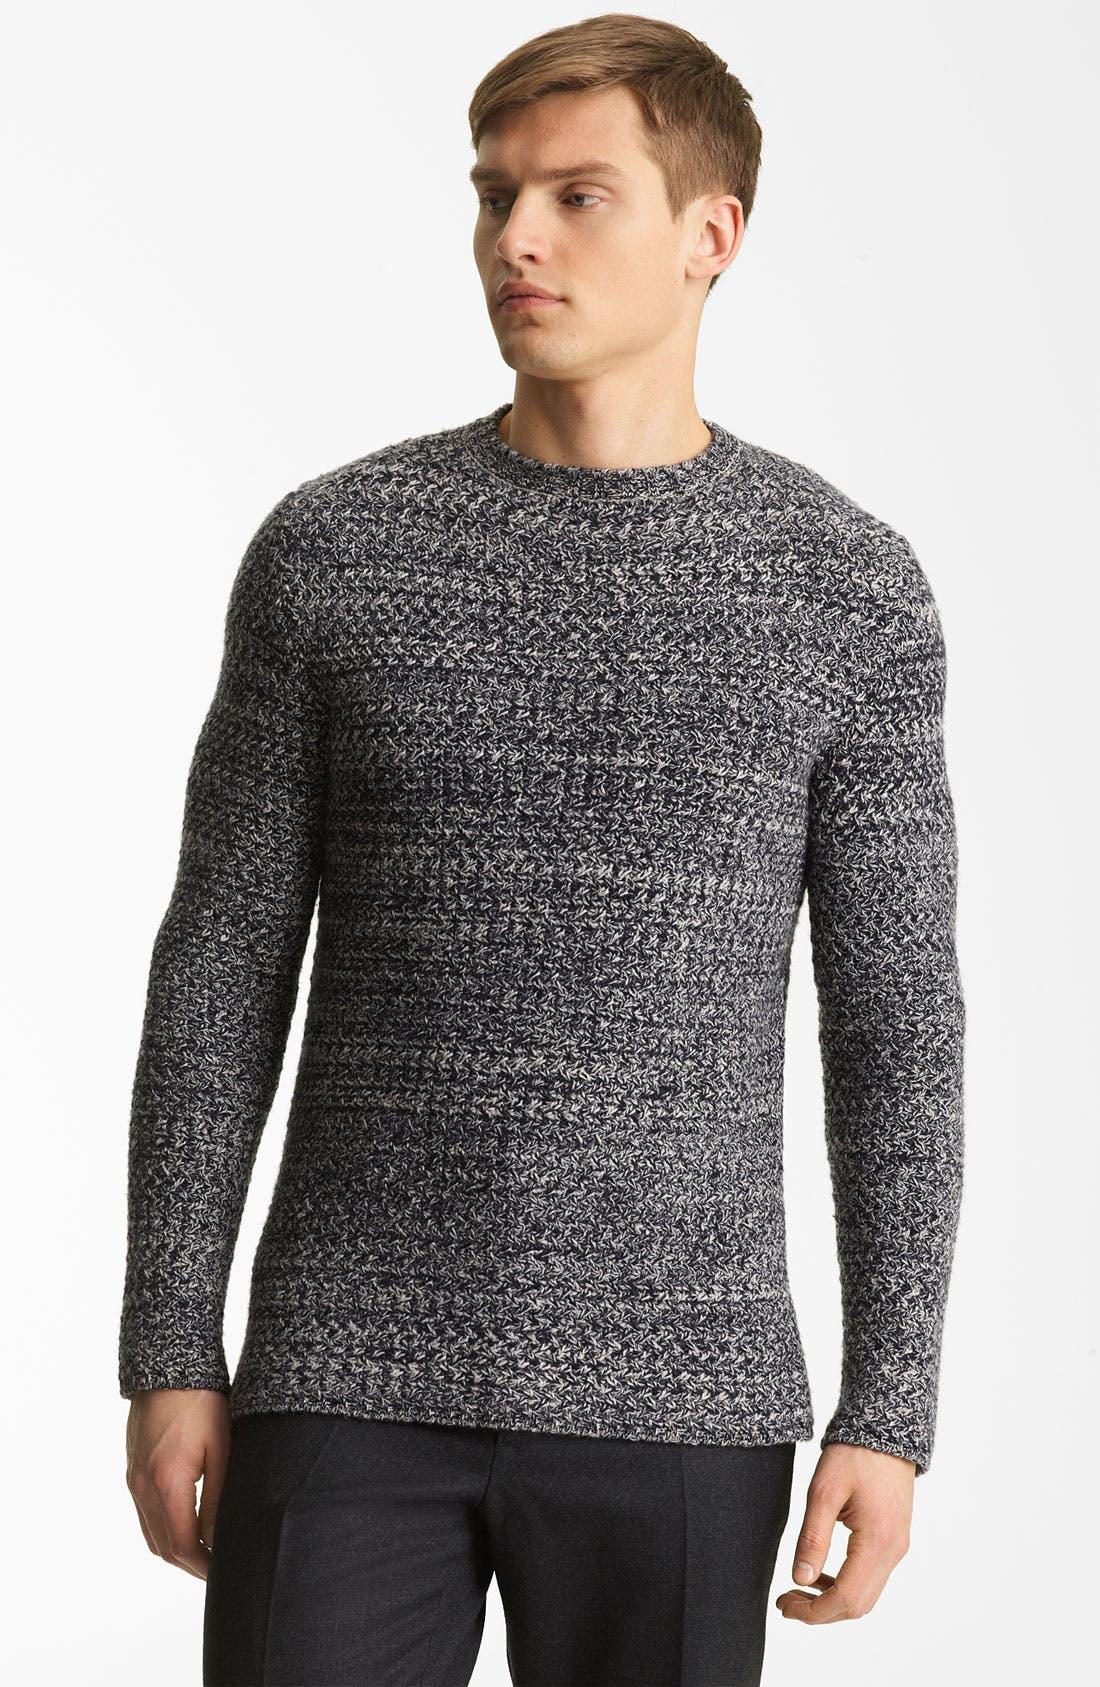 Alternate Image 1 Selected - Marni Tweed Cashmere Sweater